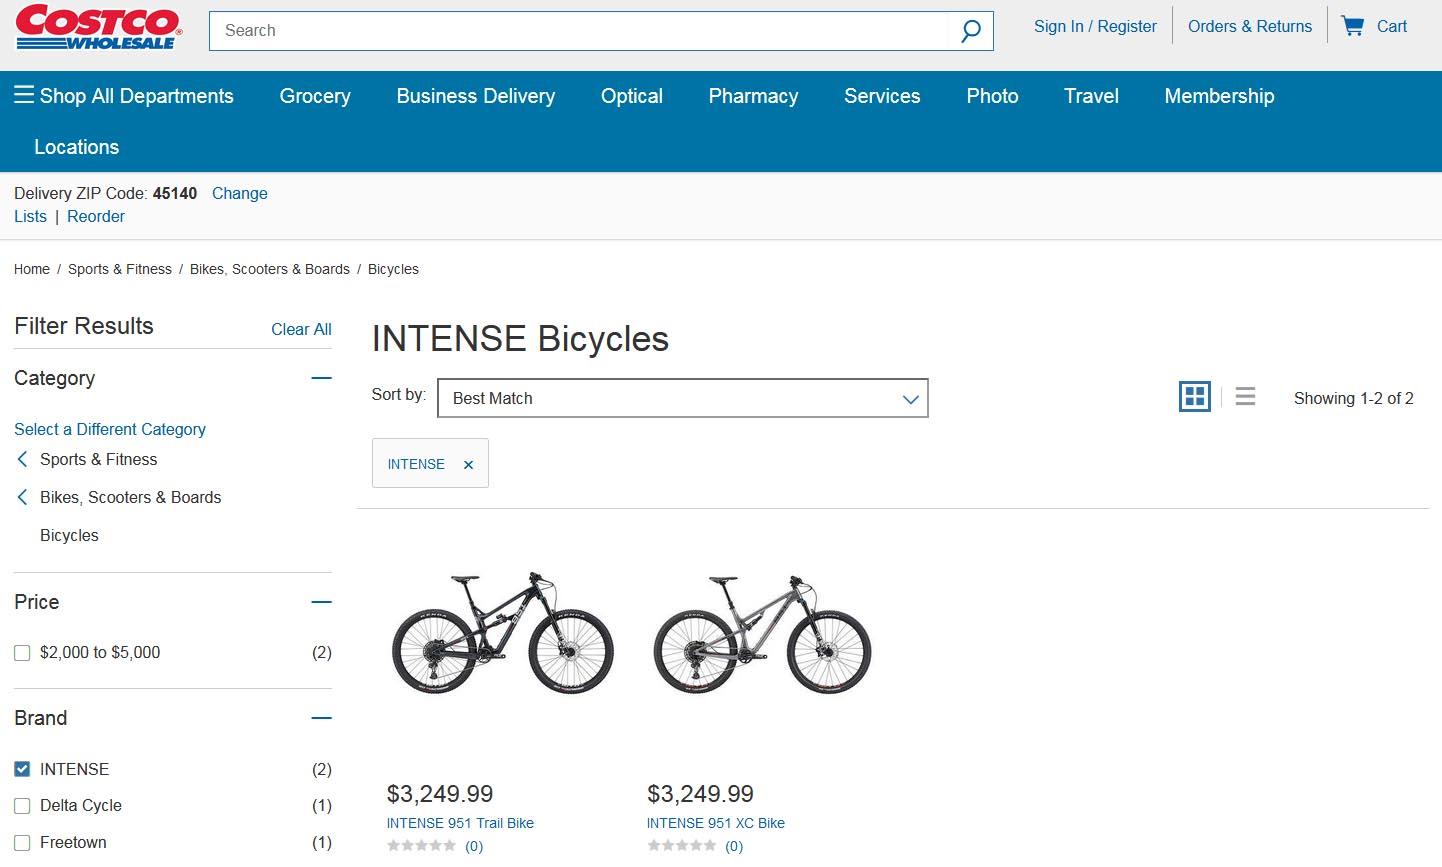 Purchase an Intense 951 mountain bike on Costco.com